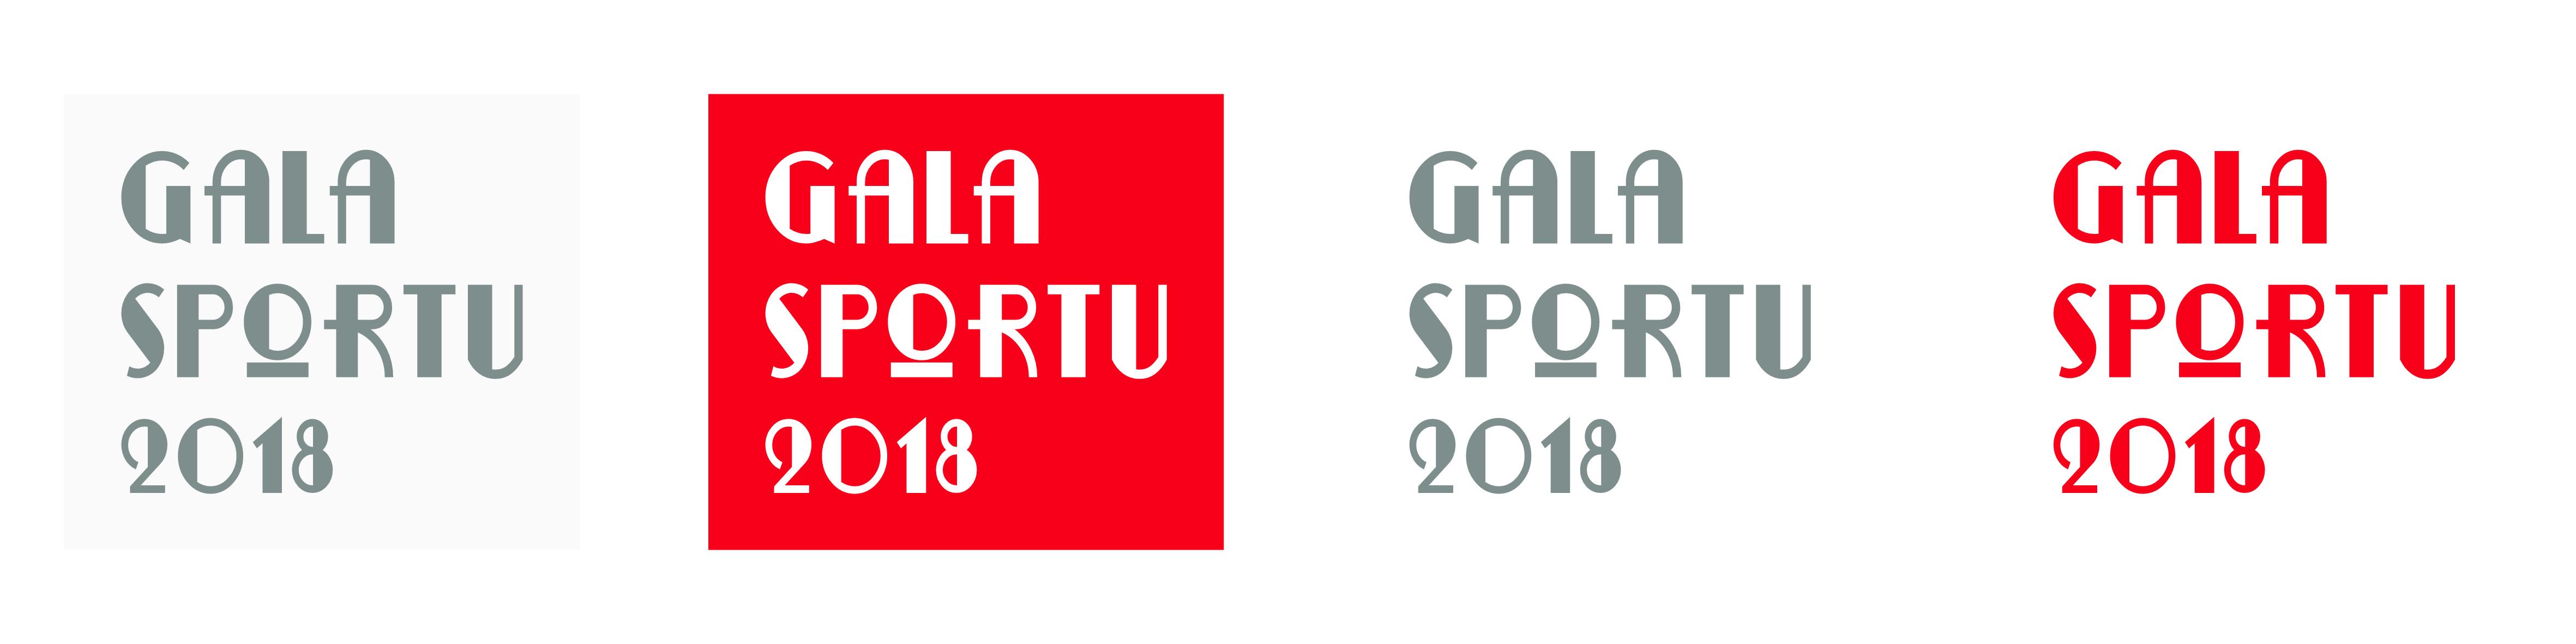 gala_sport_logo-page-0 (1)